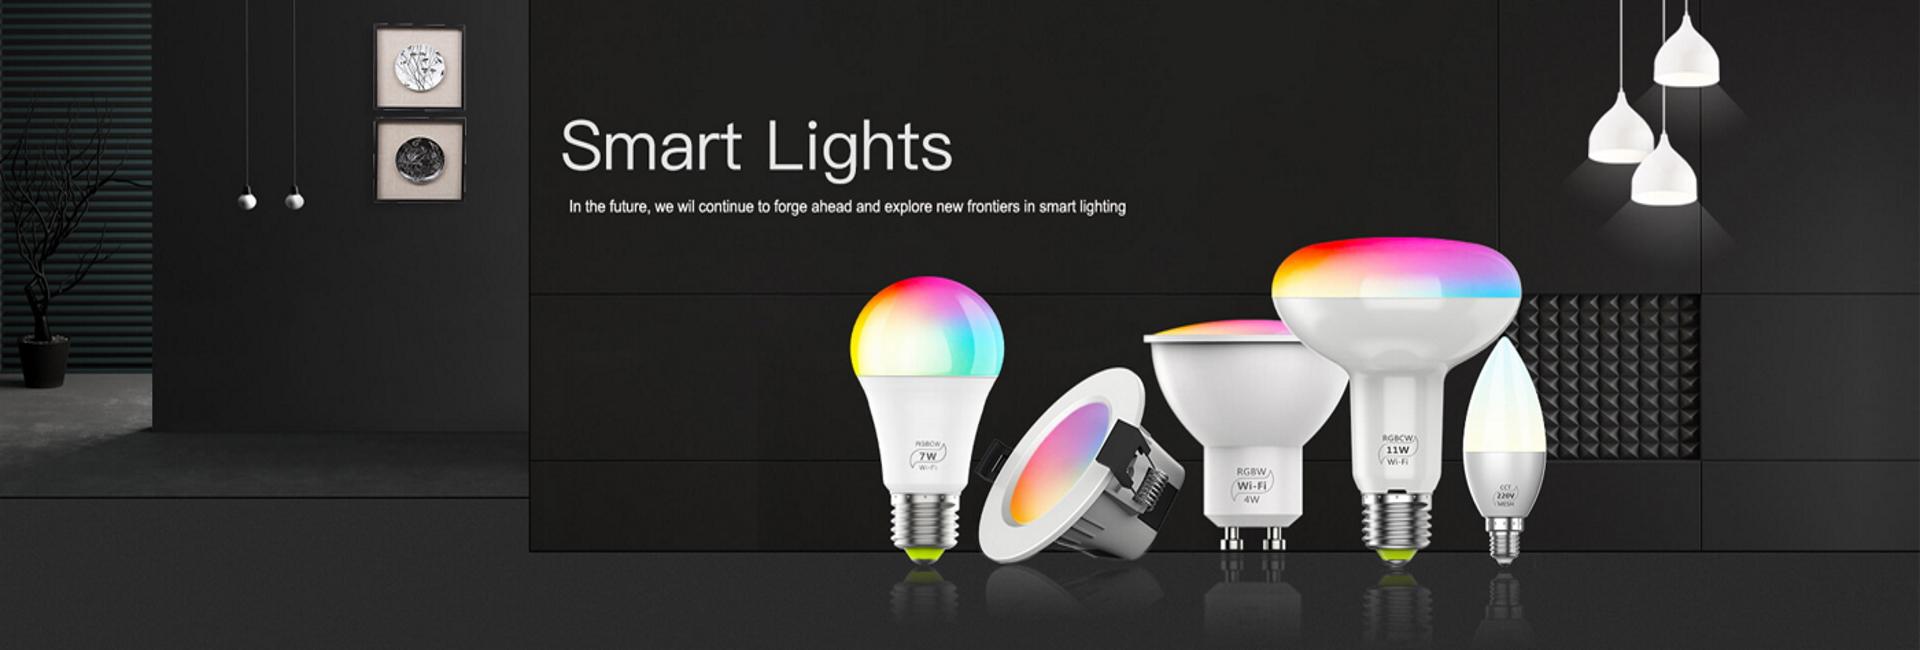 CONNECTVOLT Iluminação LED, Lda.